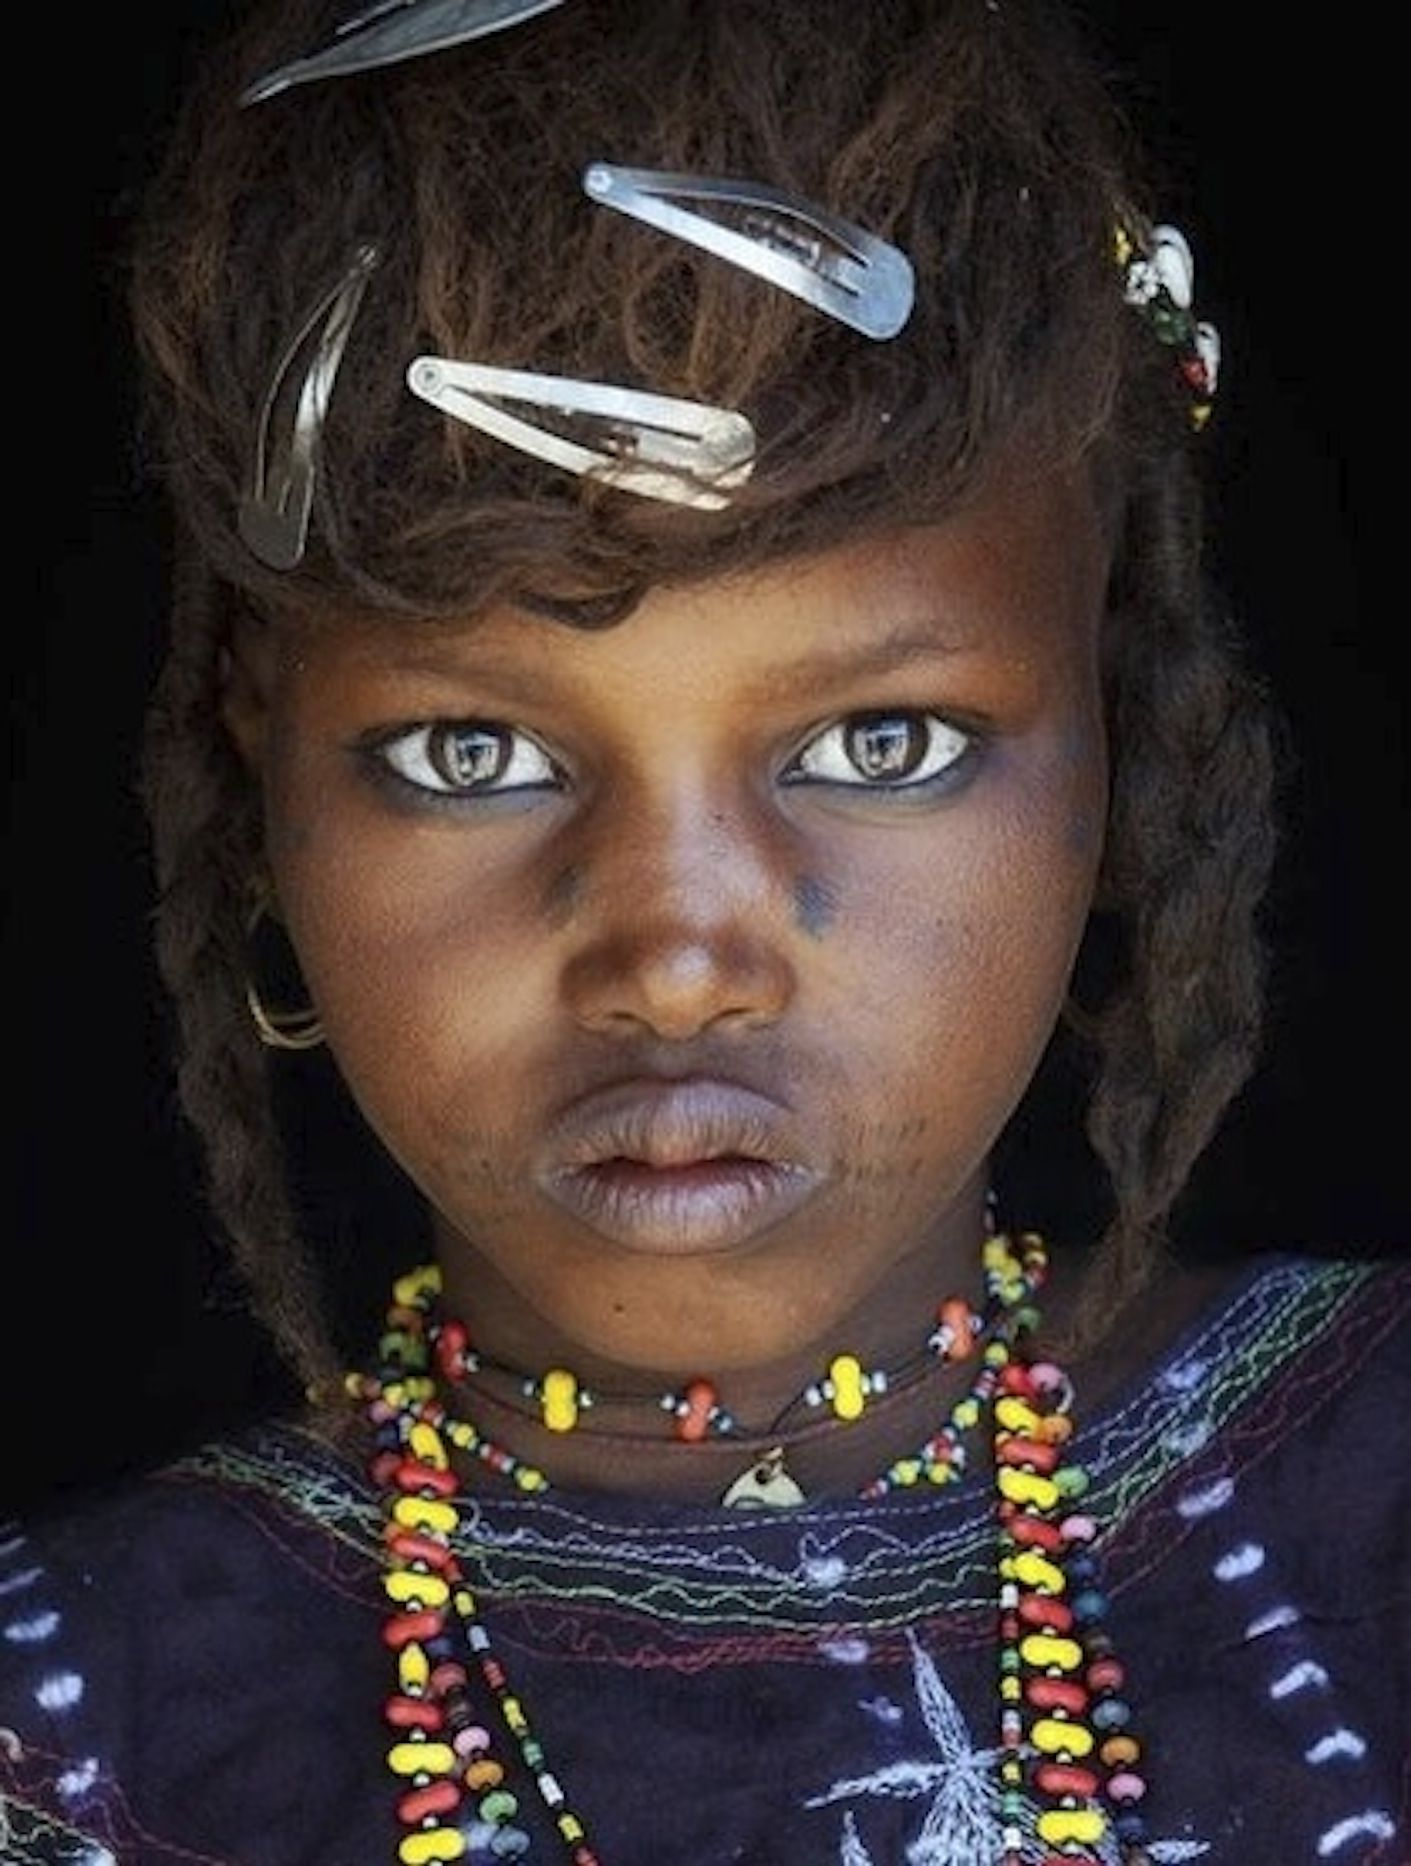 Wodaabe girl, in the decertified regions of Niger near Sahara